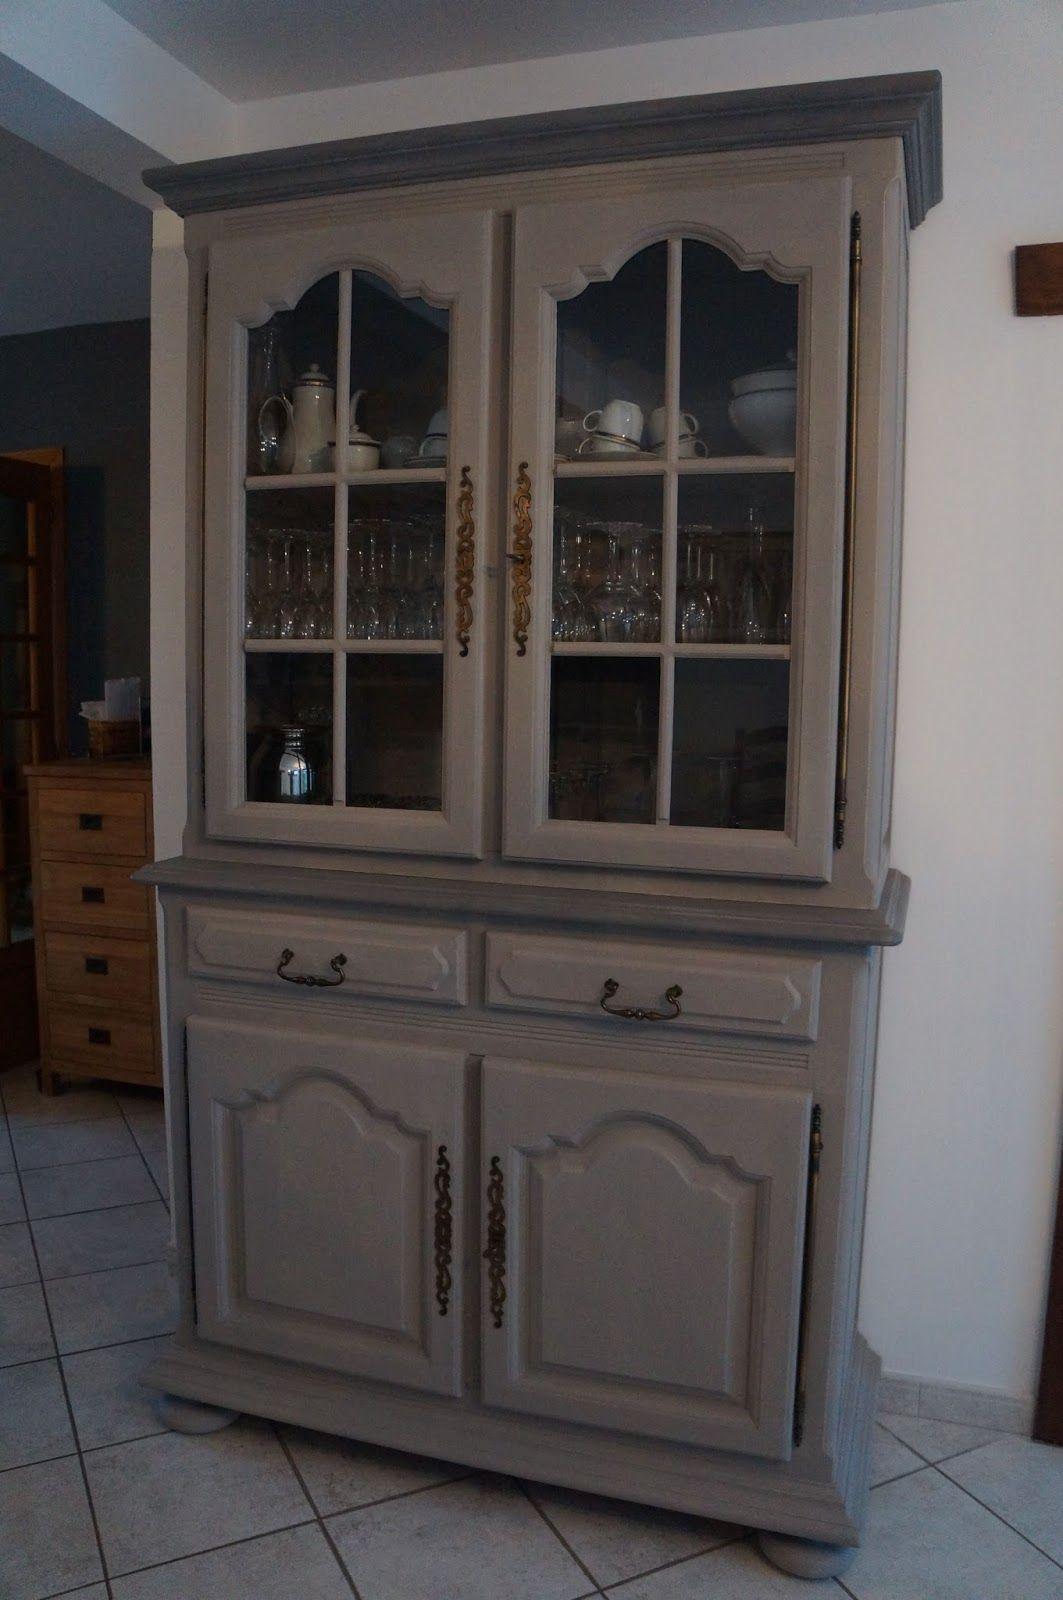 R novation vaisselier meuble en ch ne patin lin taupe nord lille urlu et berlu vieux - Relooking vieux meubles ...